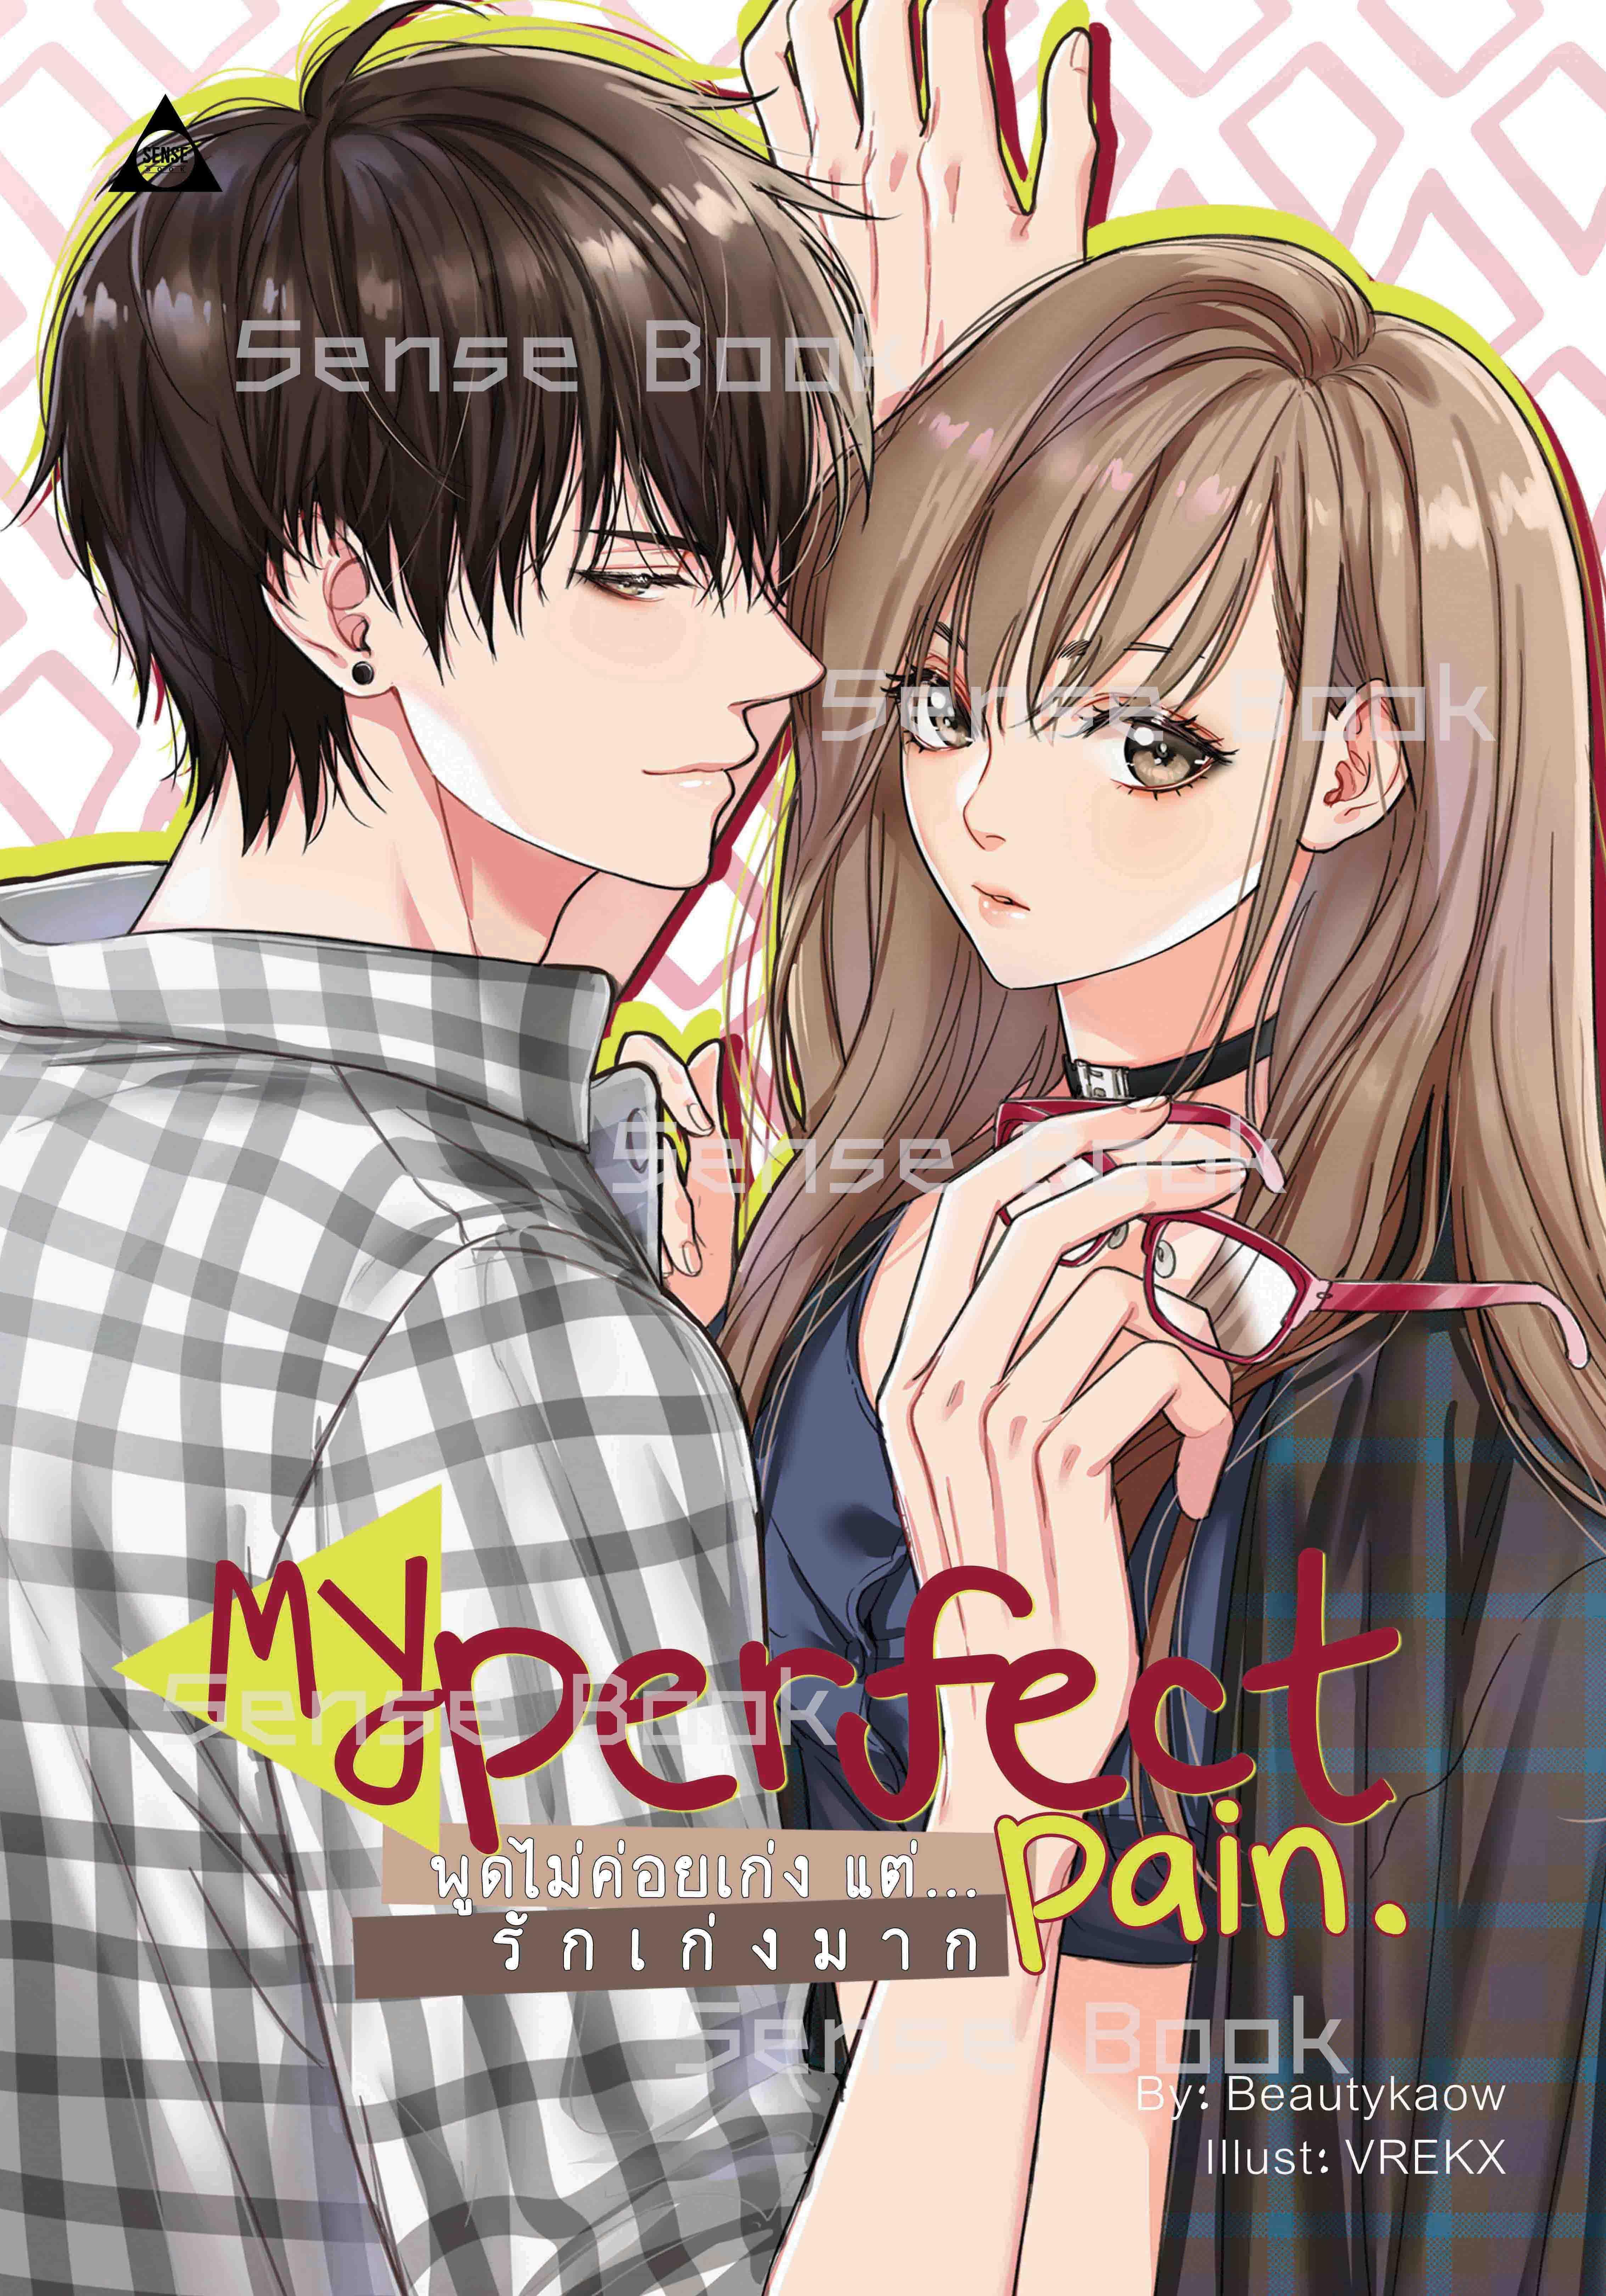 MY PERFECT PAIN พูดไม่ค่อยเก่ง แต่... รักเก่งมาก / Beautykaow